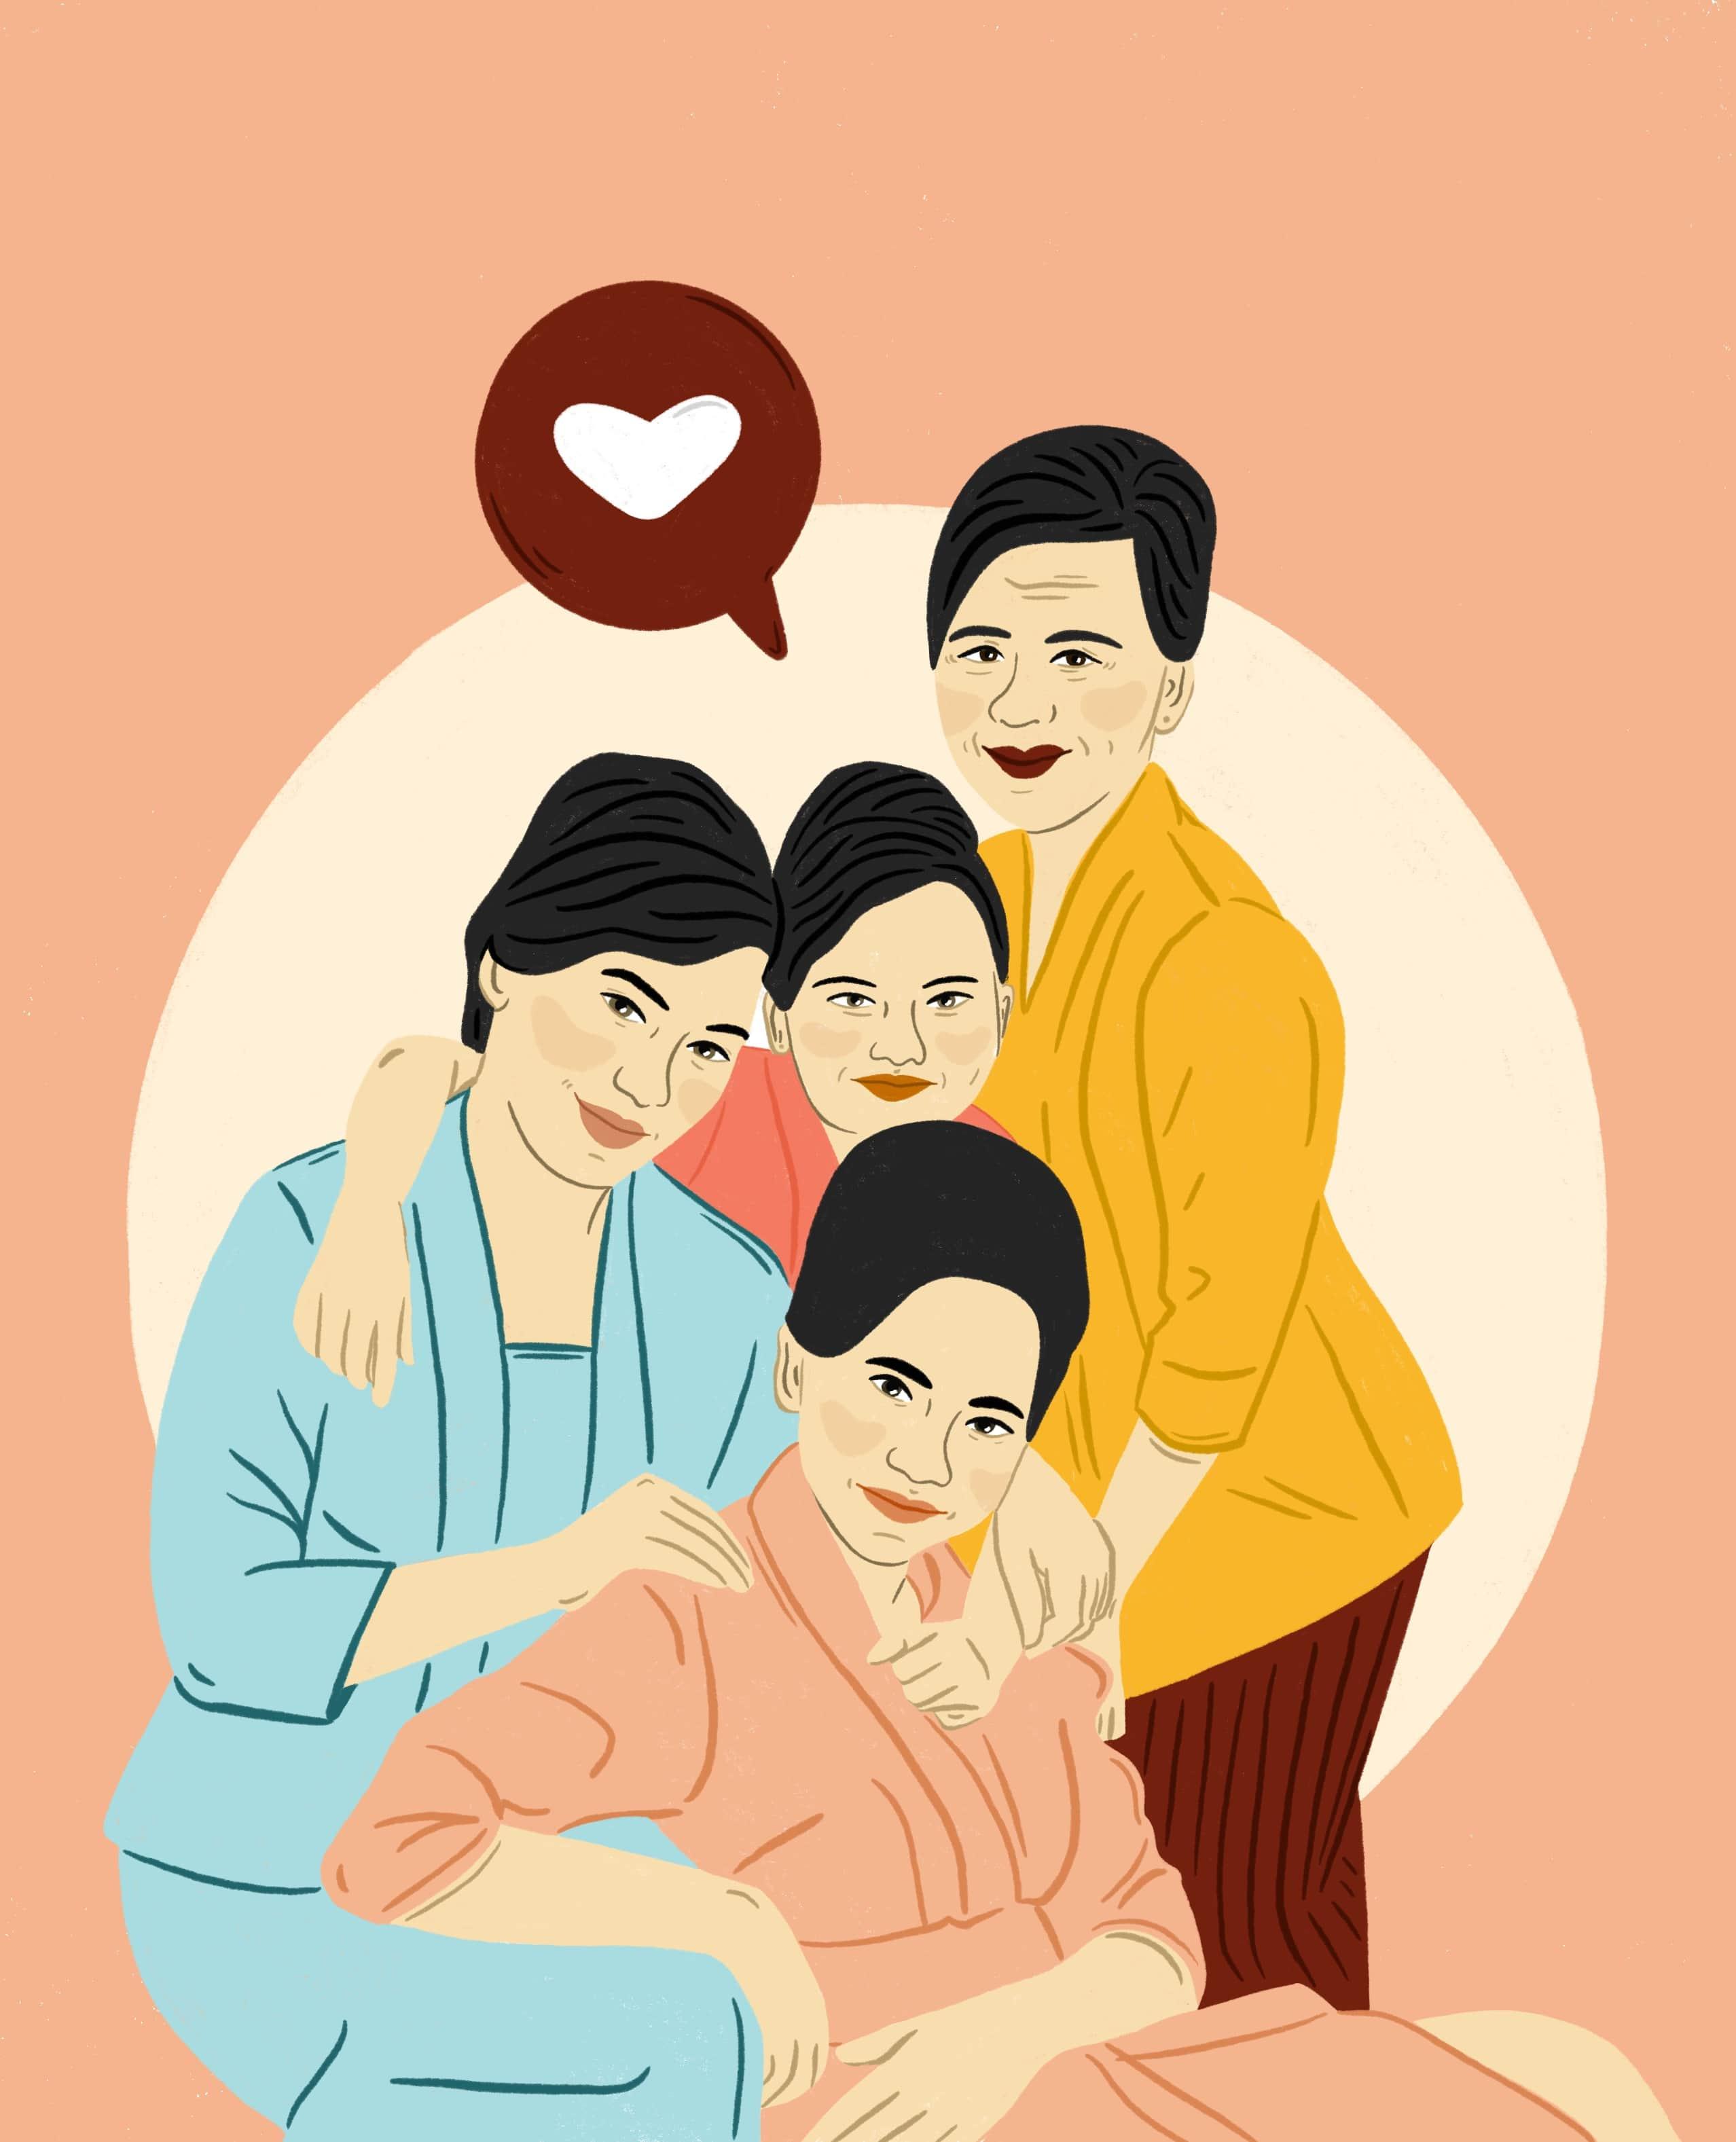 Illustration of family portrait, 4 generations.